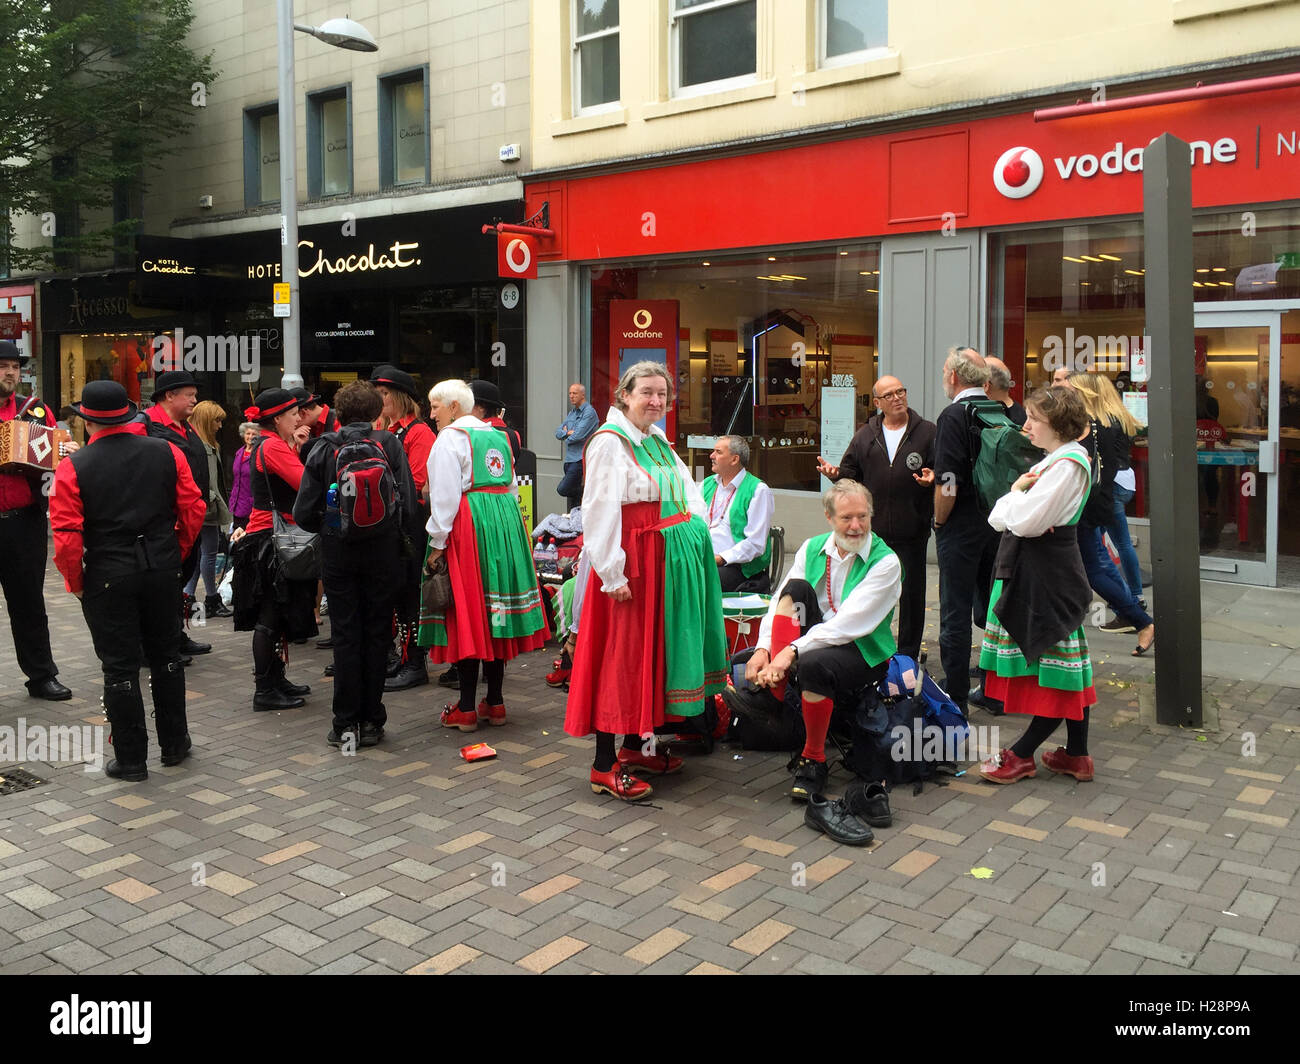 Morris ballerini ottenere pronto per eseguire, Albert street. a Nottingham, Inghilterra. Foto Stock